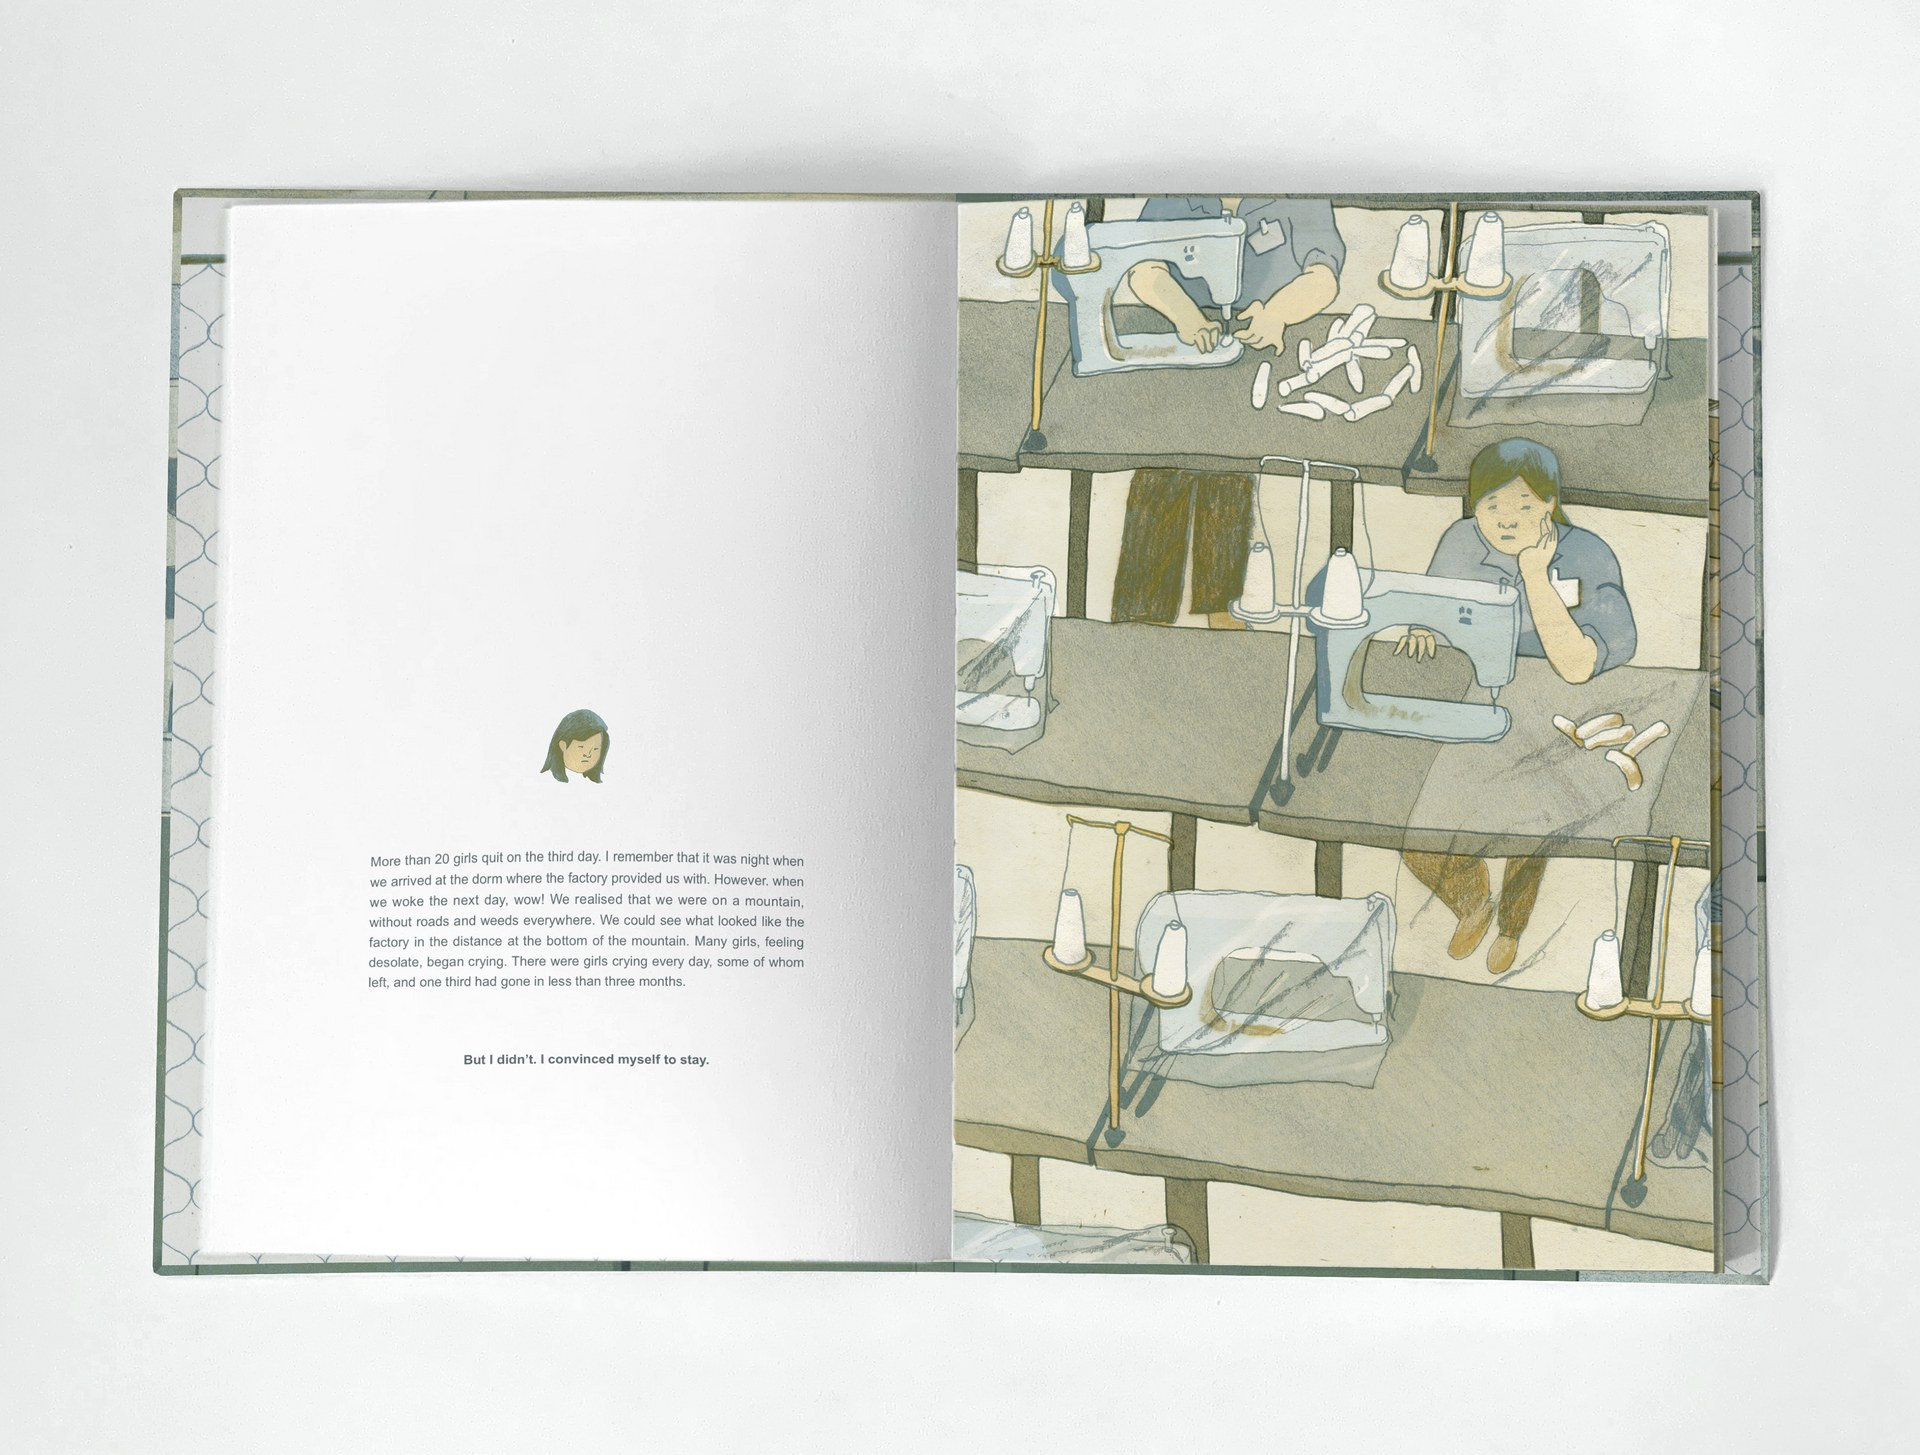 pp.18-19